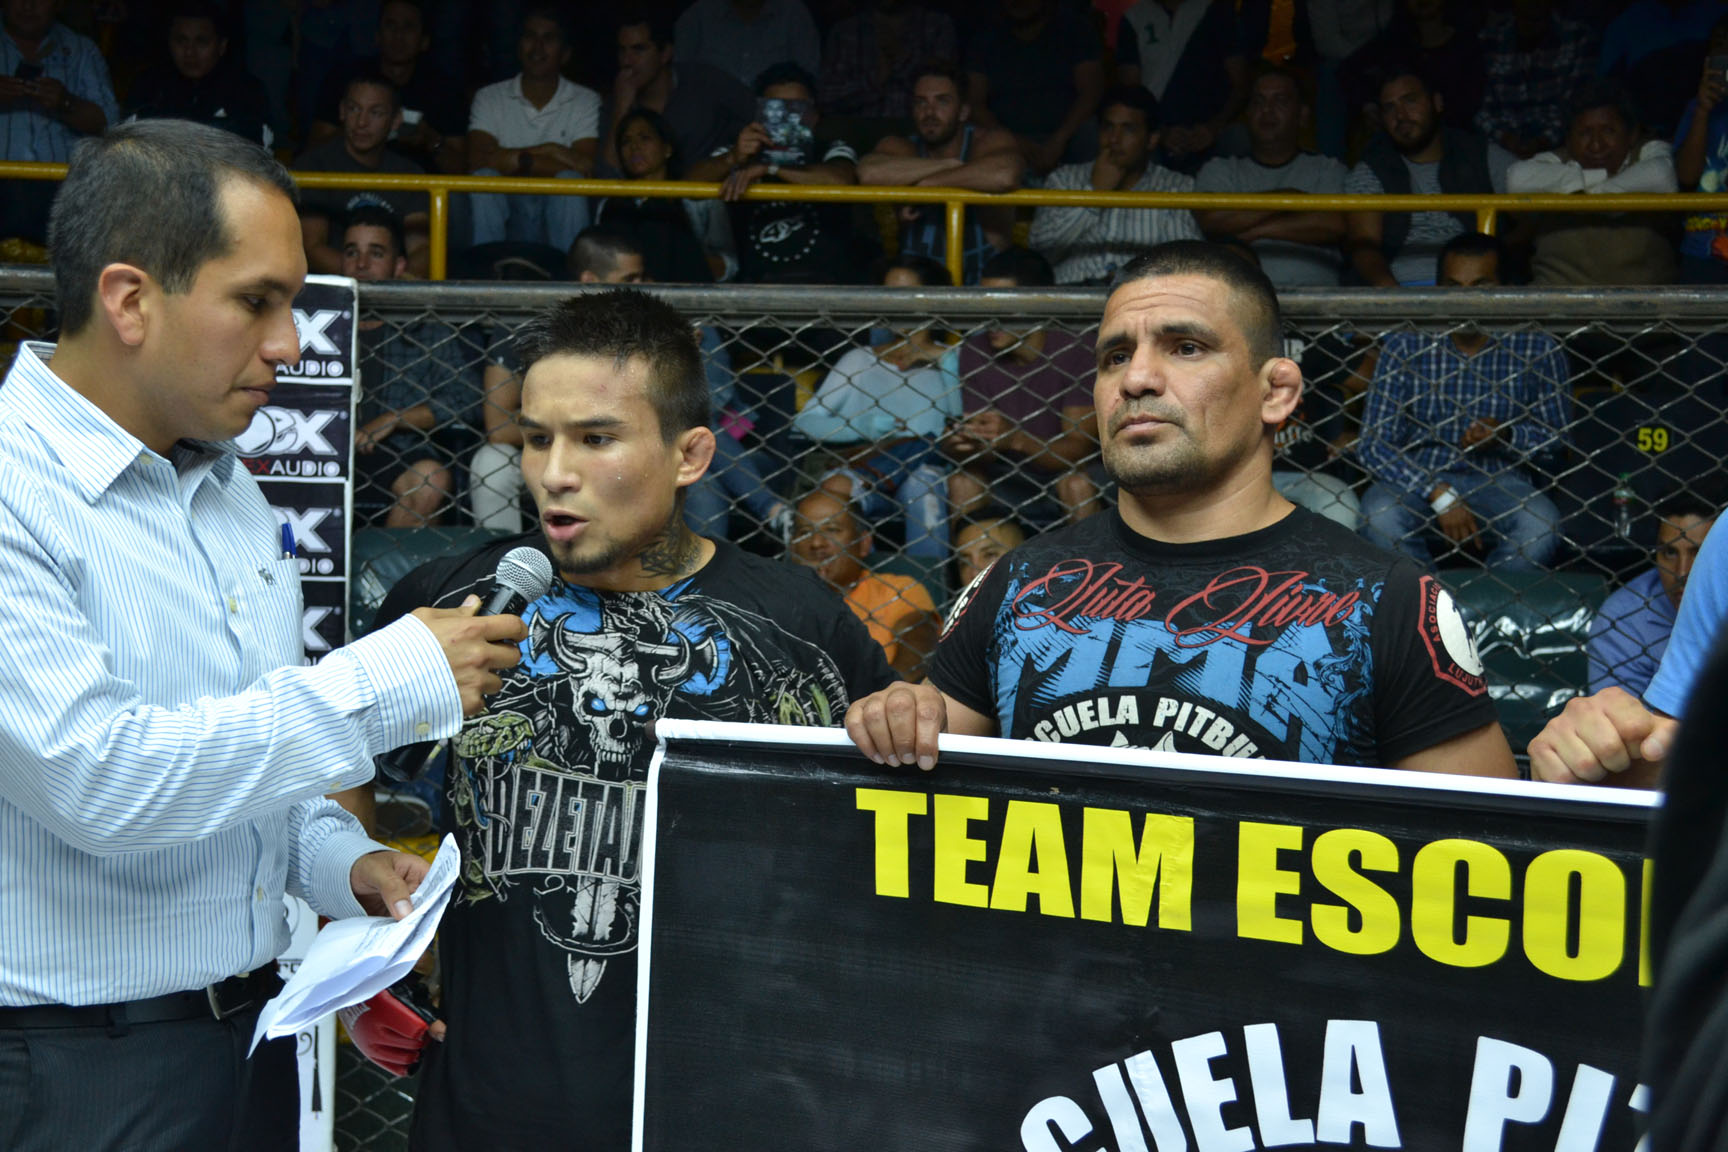 #PerroMalo, #TeamEscorpion #MMAPeru #LutaLivre